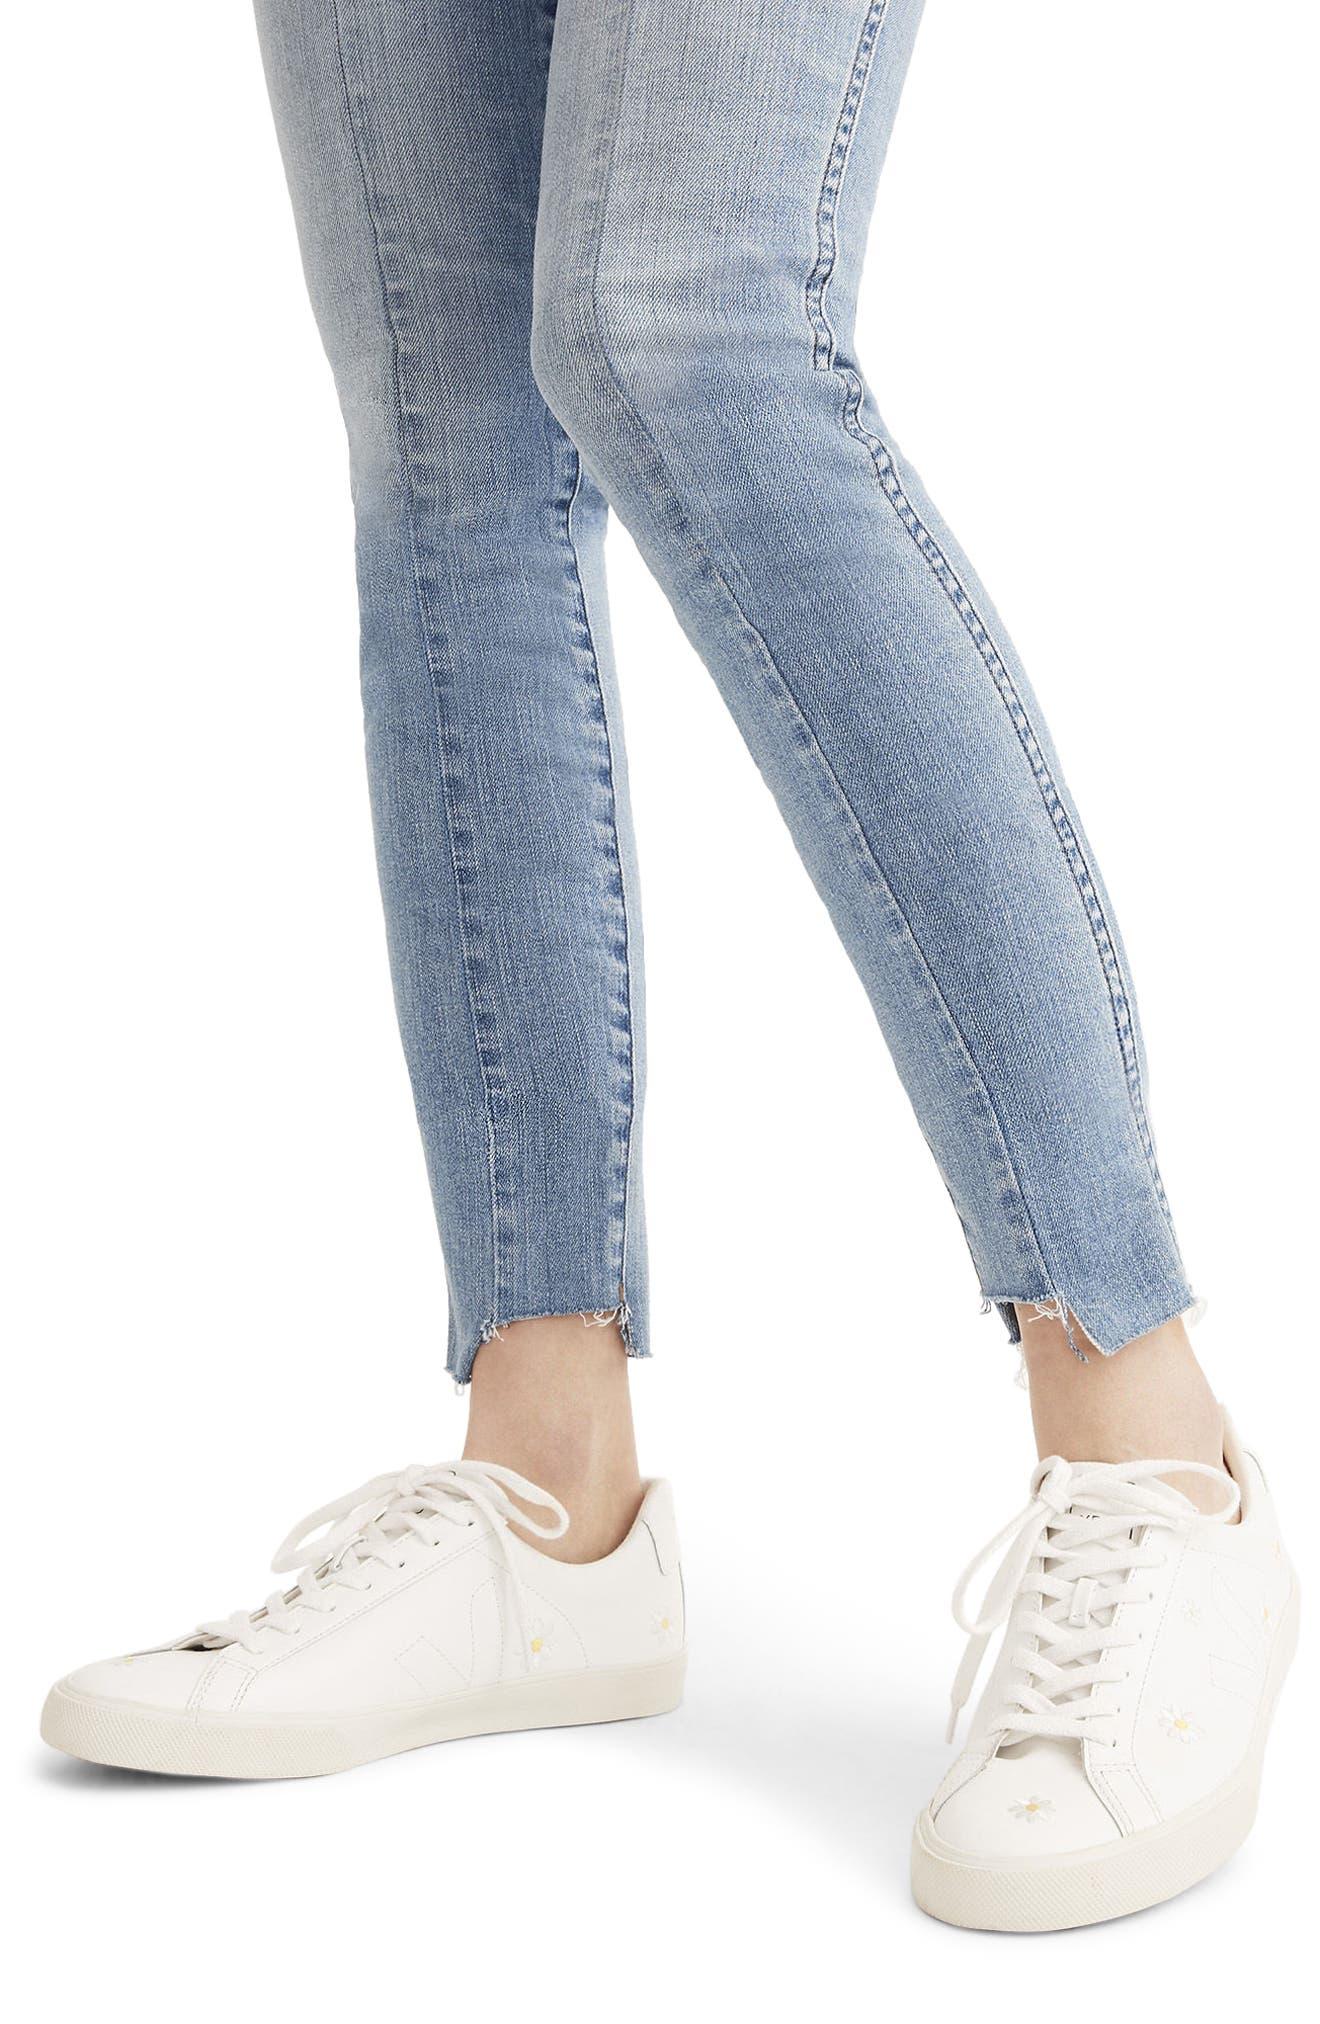 MADEWELL, 9-Inch High Waist Seamed Step-Hem Edition Skinny Jeans, Alternate thumbnail 6, color, 400